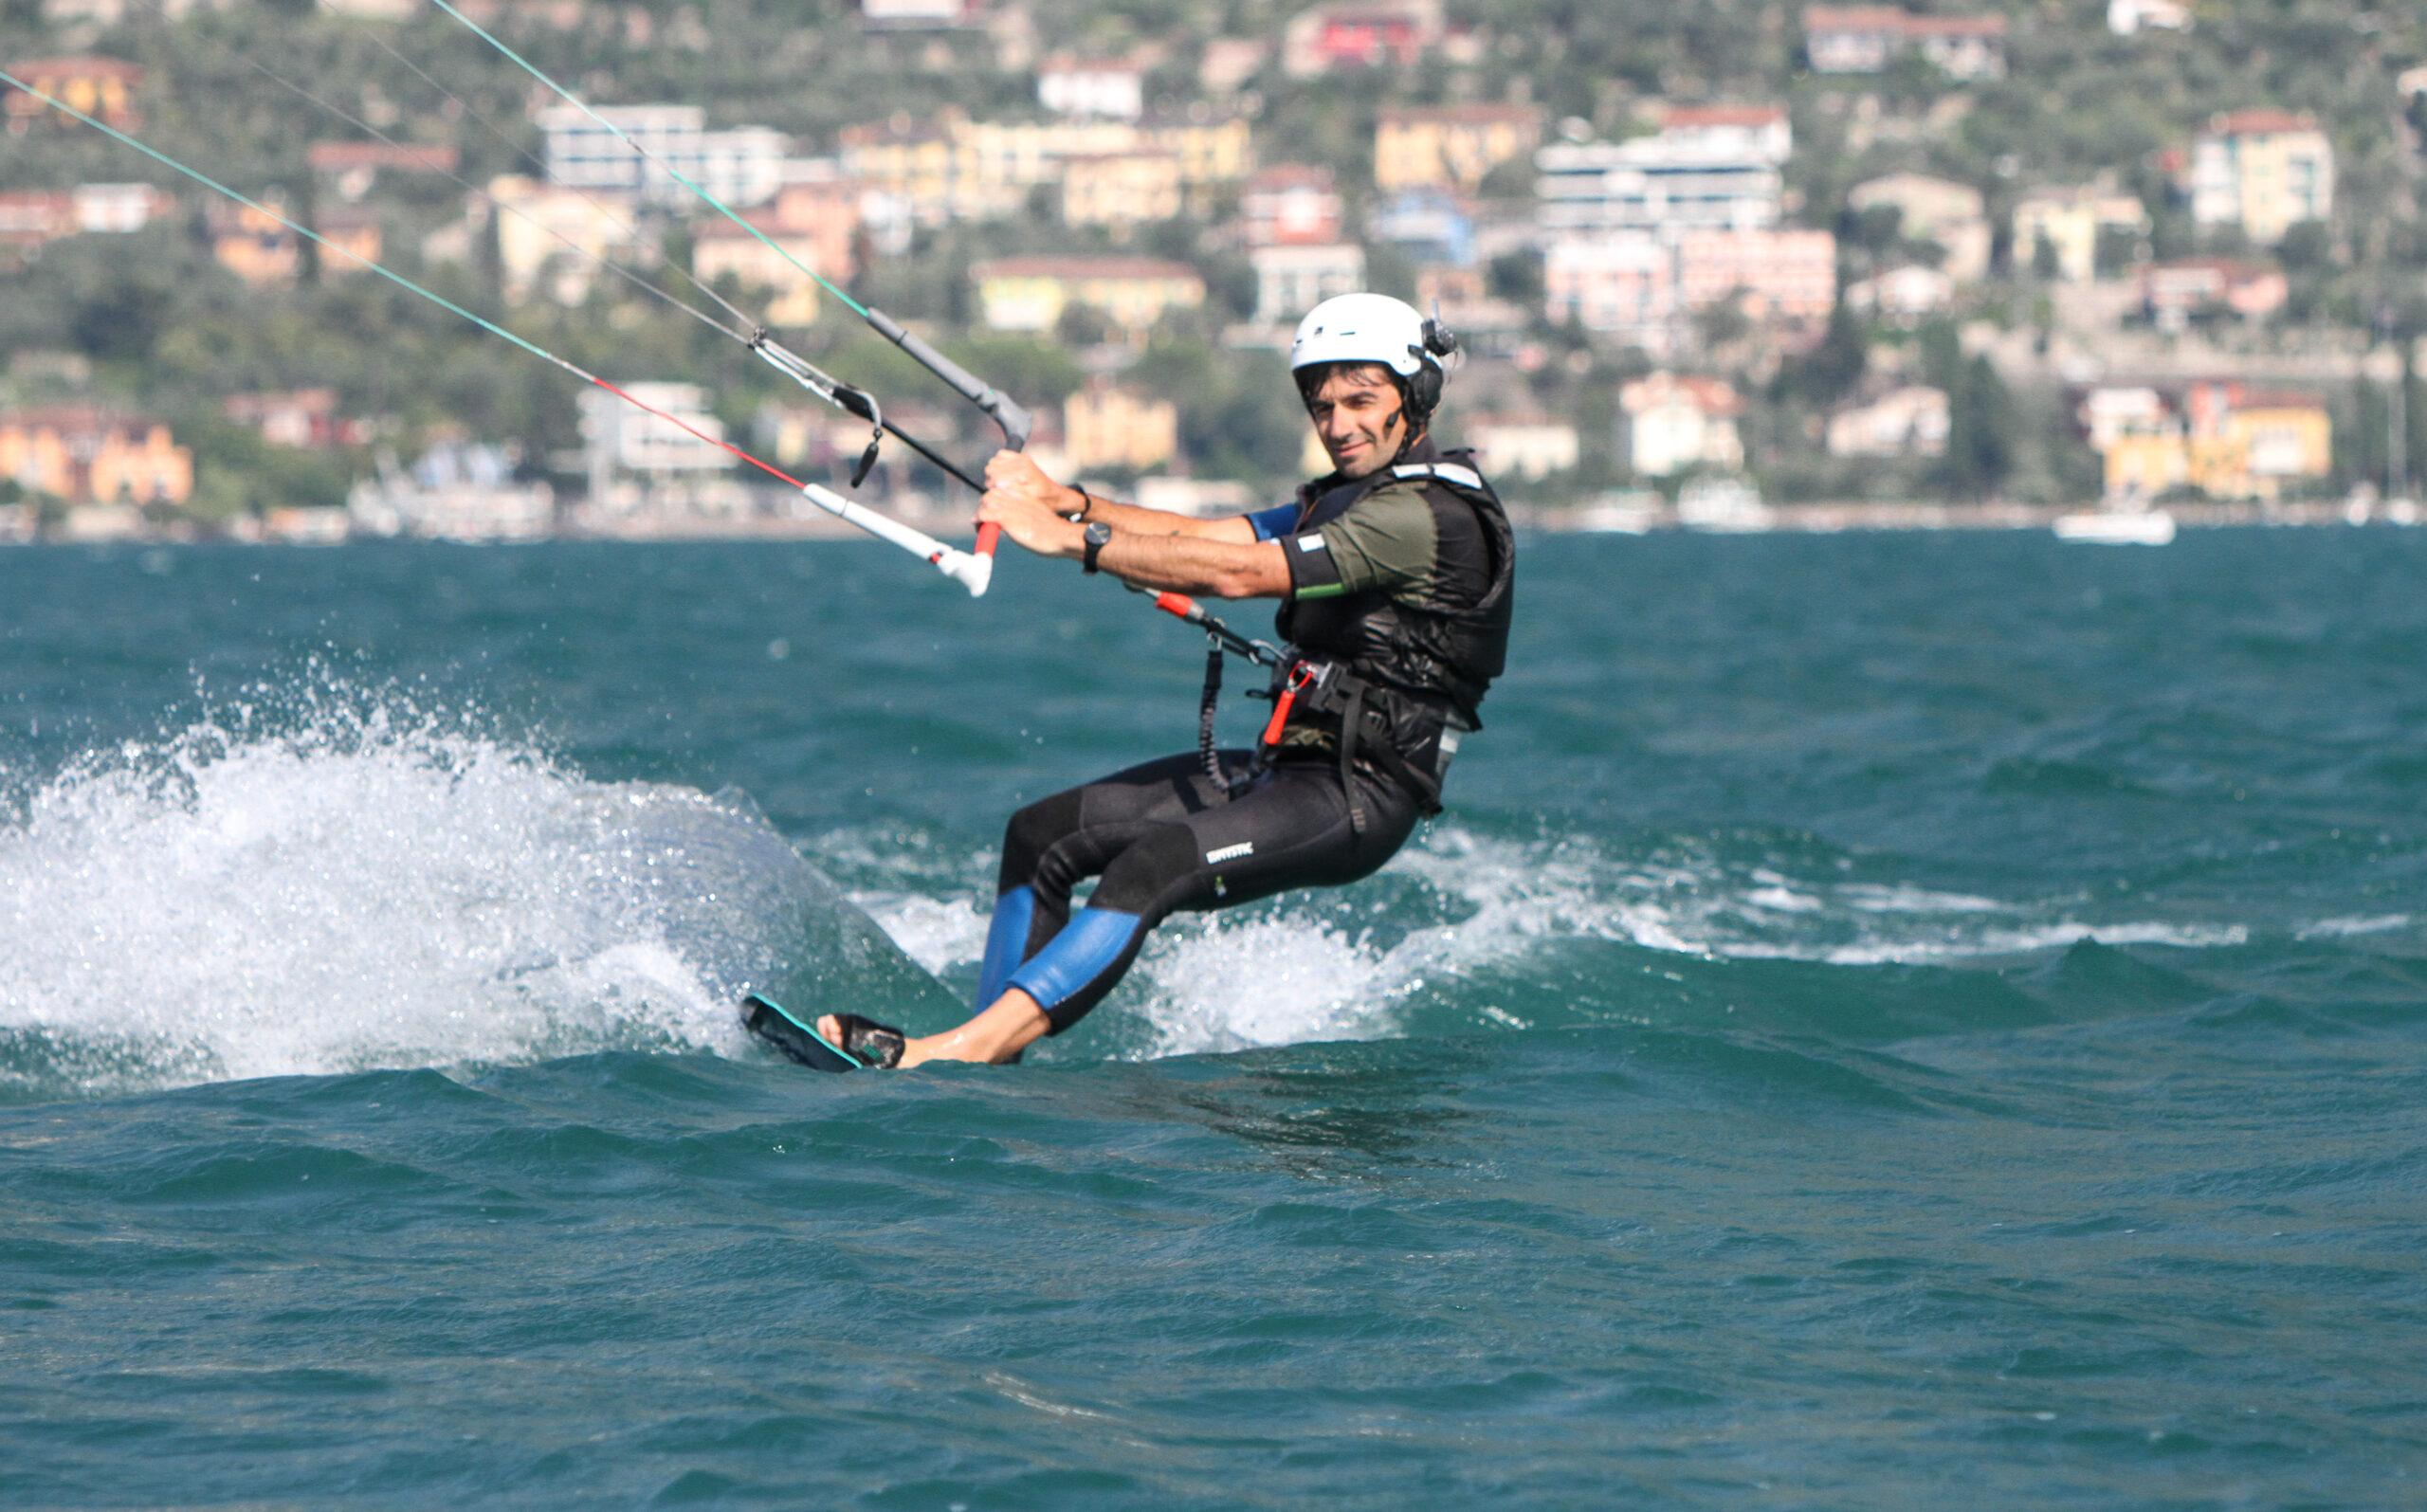 corso-kitesurf-bolina-gardakitesurf-gallery-1